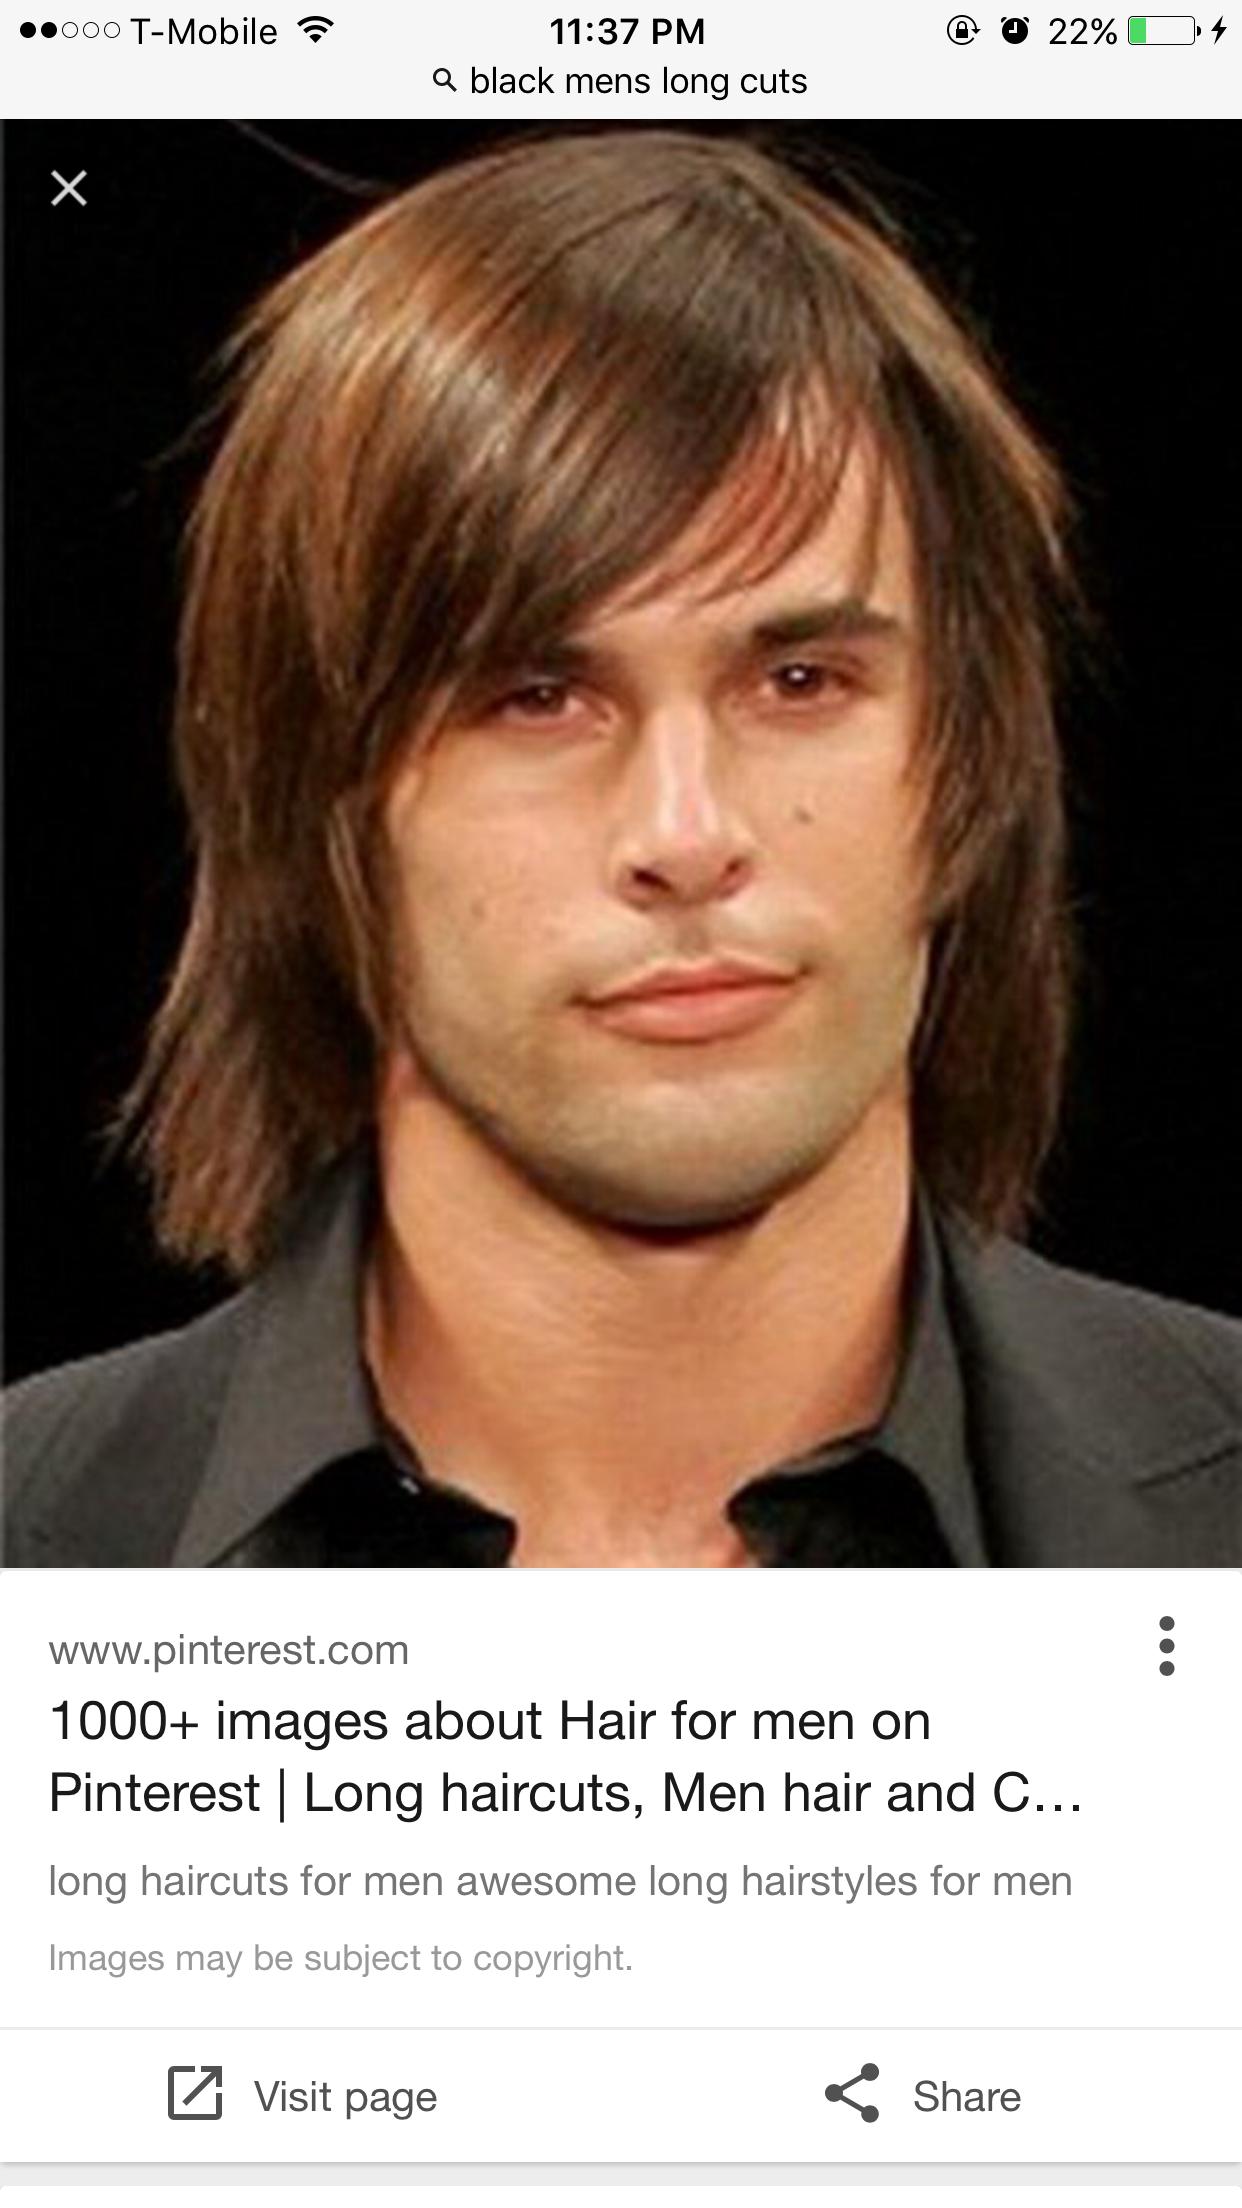 Pin von Vegas auf Long haircuts